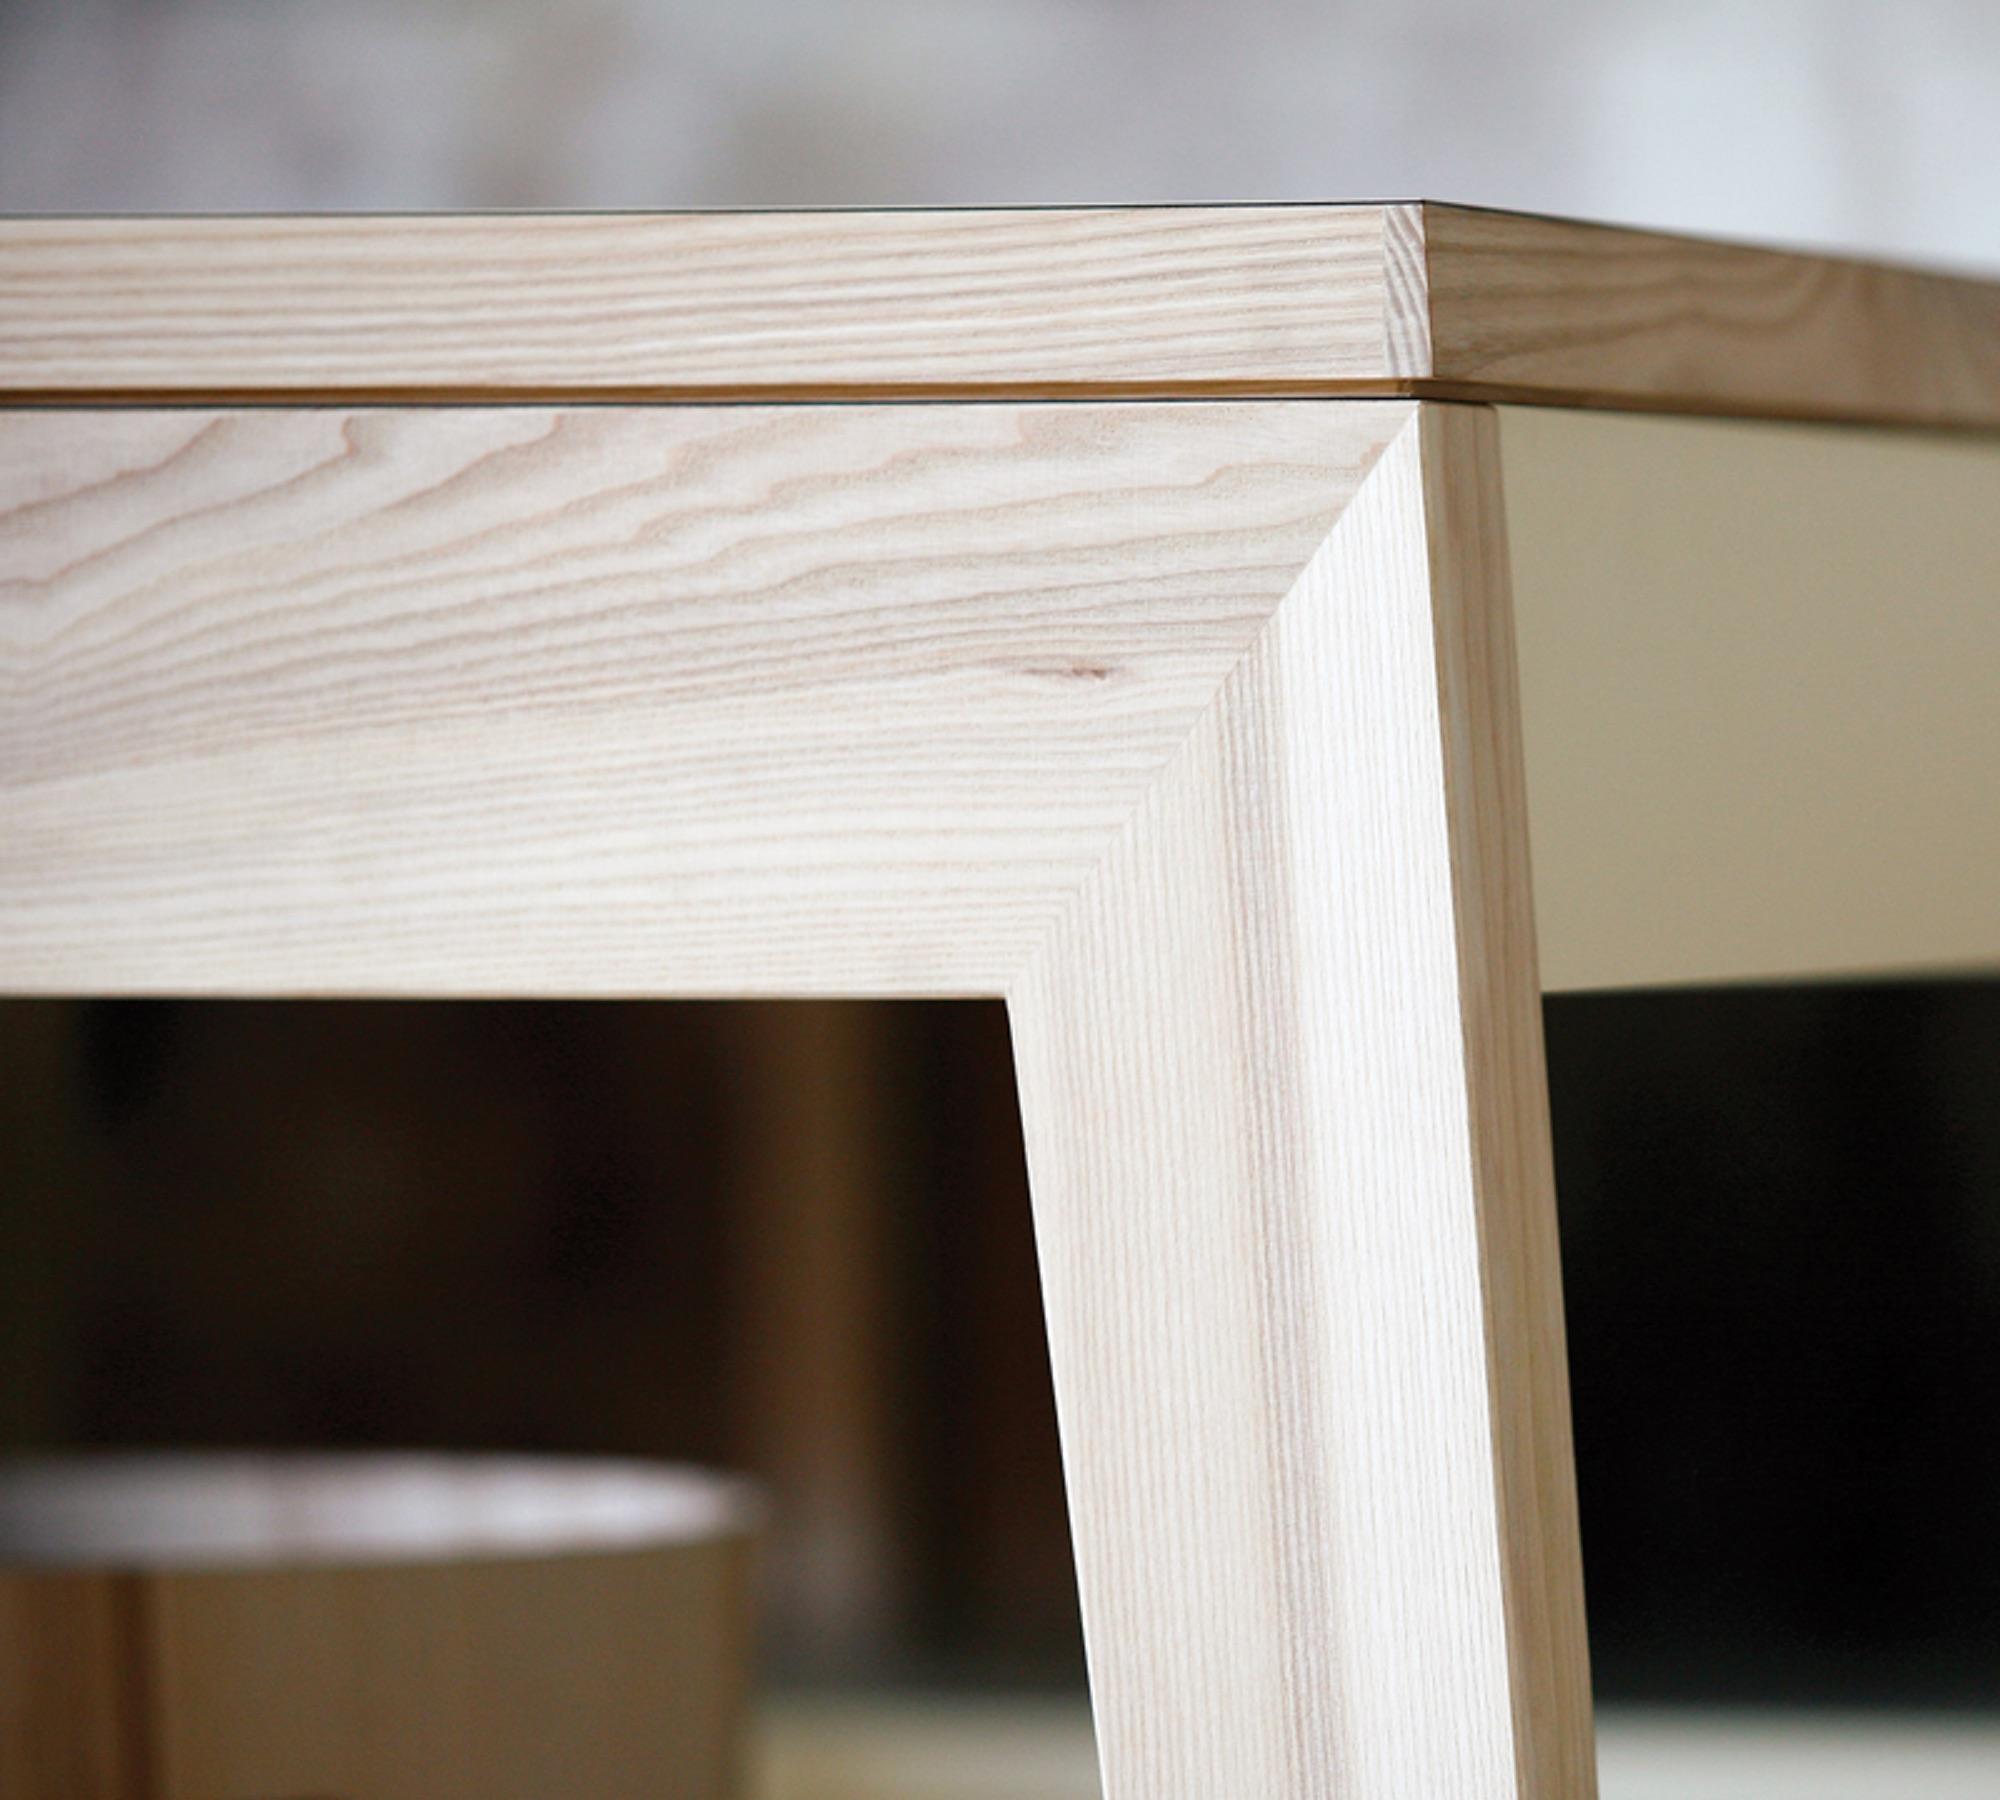 mint design k chenzeile m1001 mit echtholz und gro er ablage 10008359. Black Bedroom Furniture Sets. Home Design Ideas